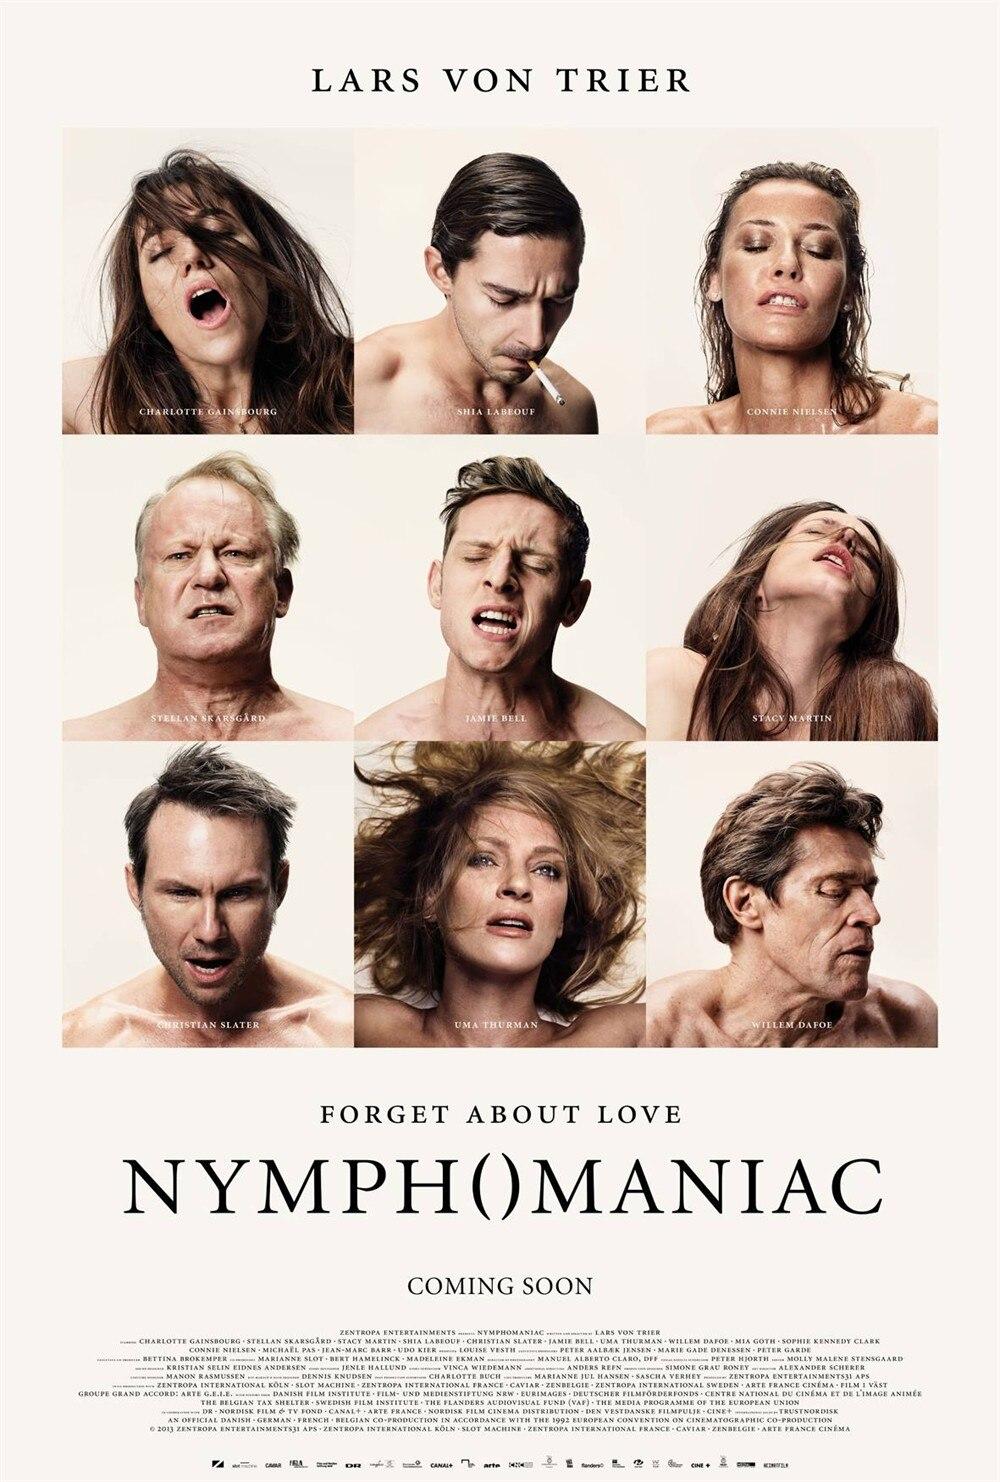 NYMPHOMANIAC фильм Кристиан Слейтер ума Турман Шелковый плакат декоративной живописи 24x36 дюймов